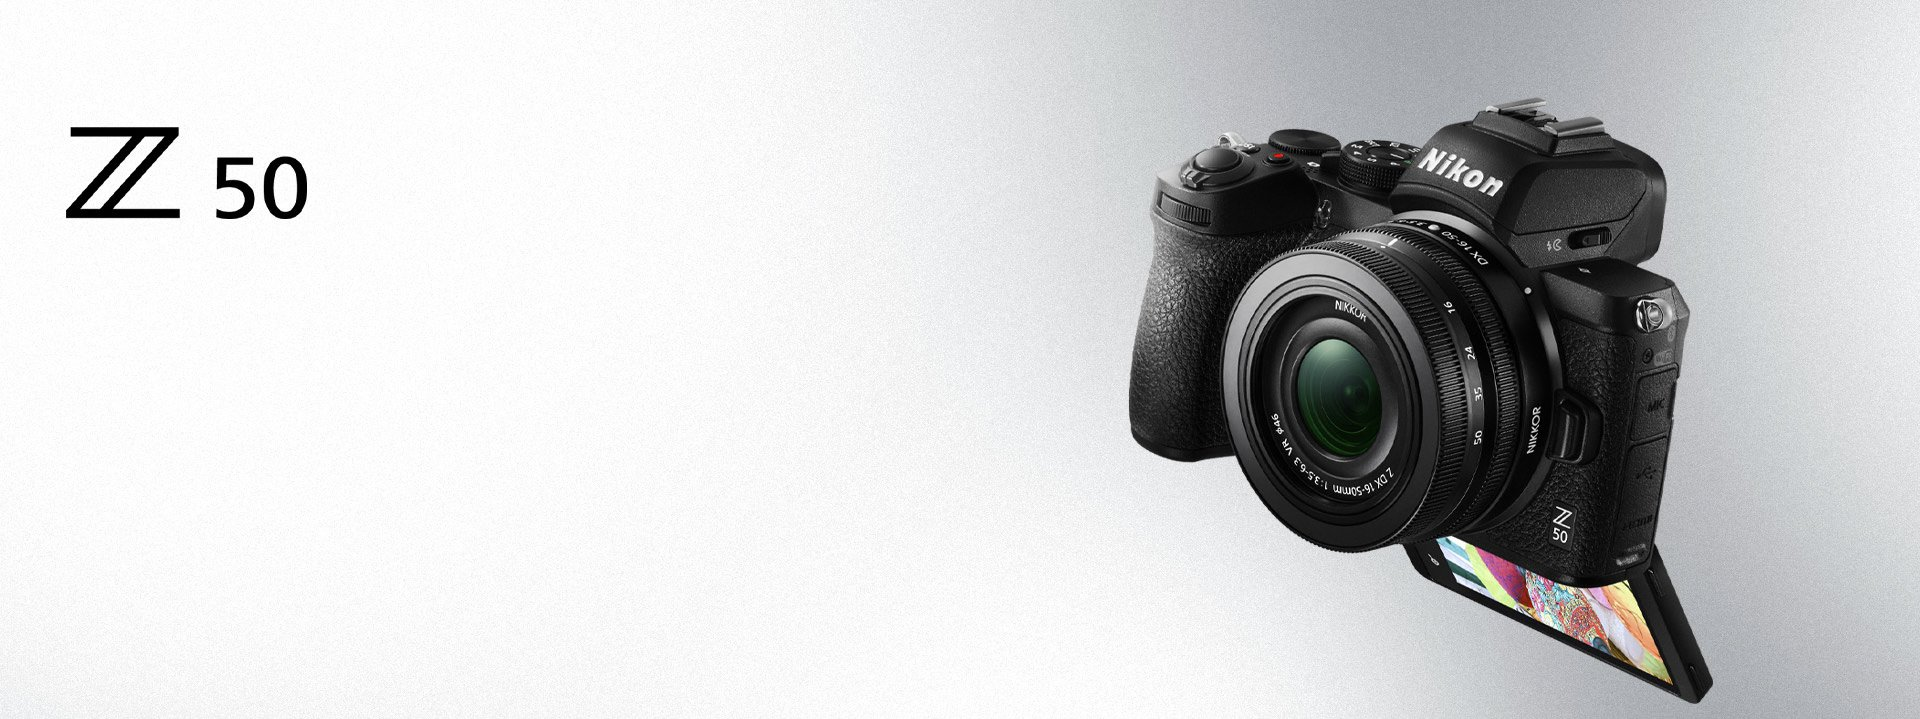 NIKON Z50 DX 16-50 KIT的圖片搜尋結果